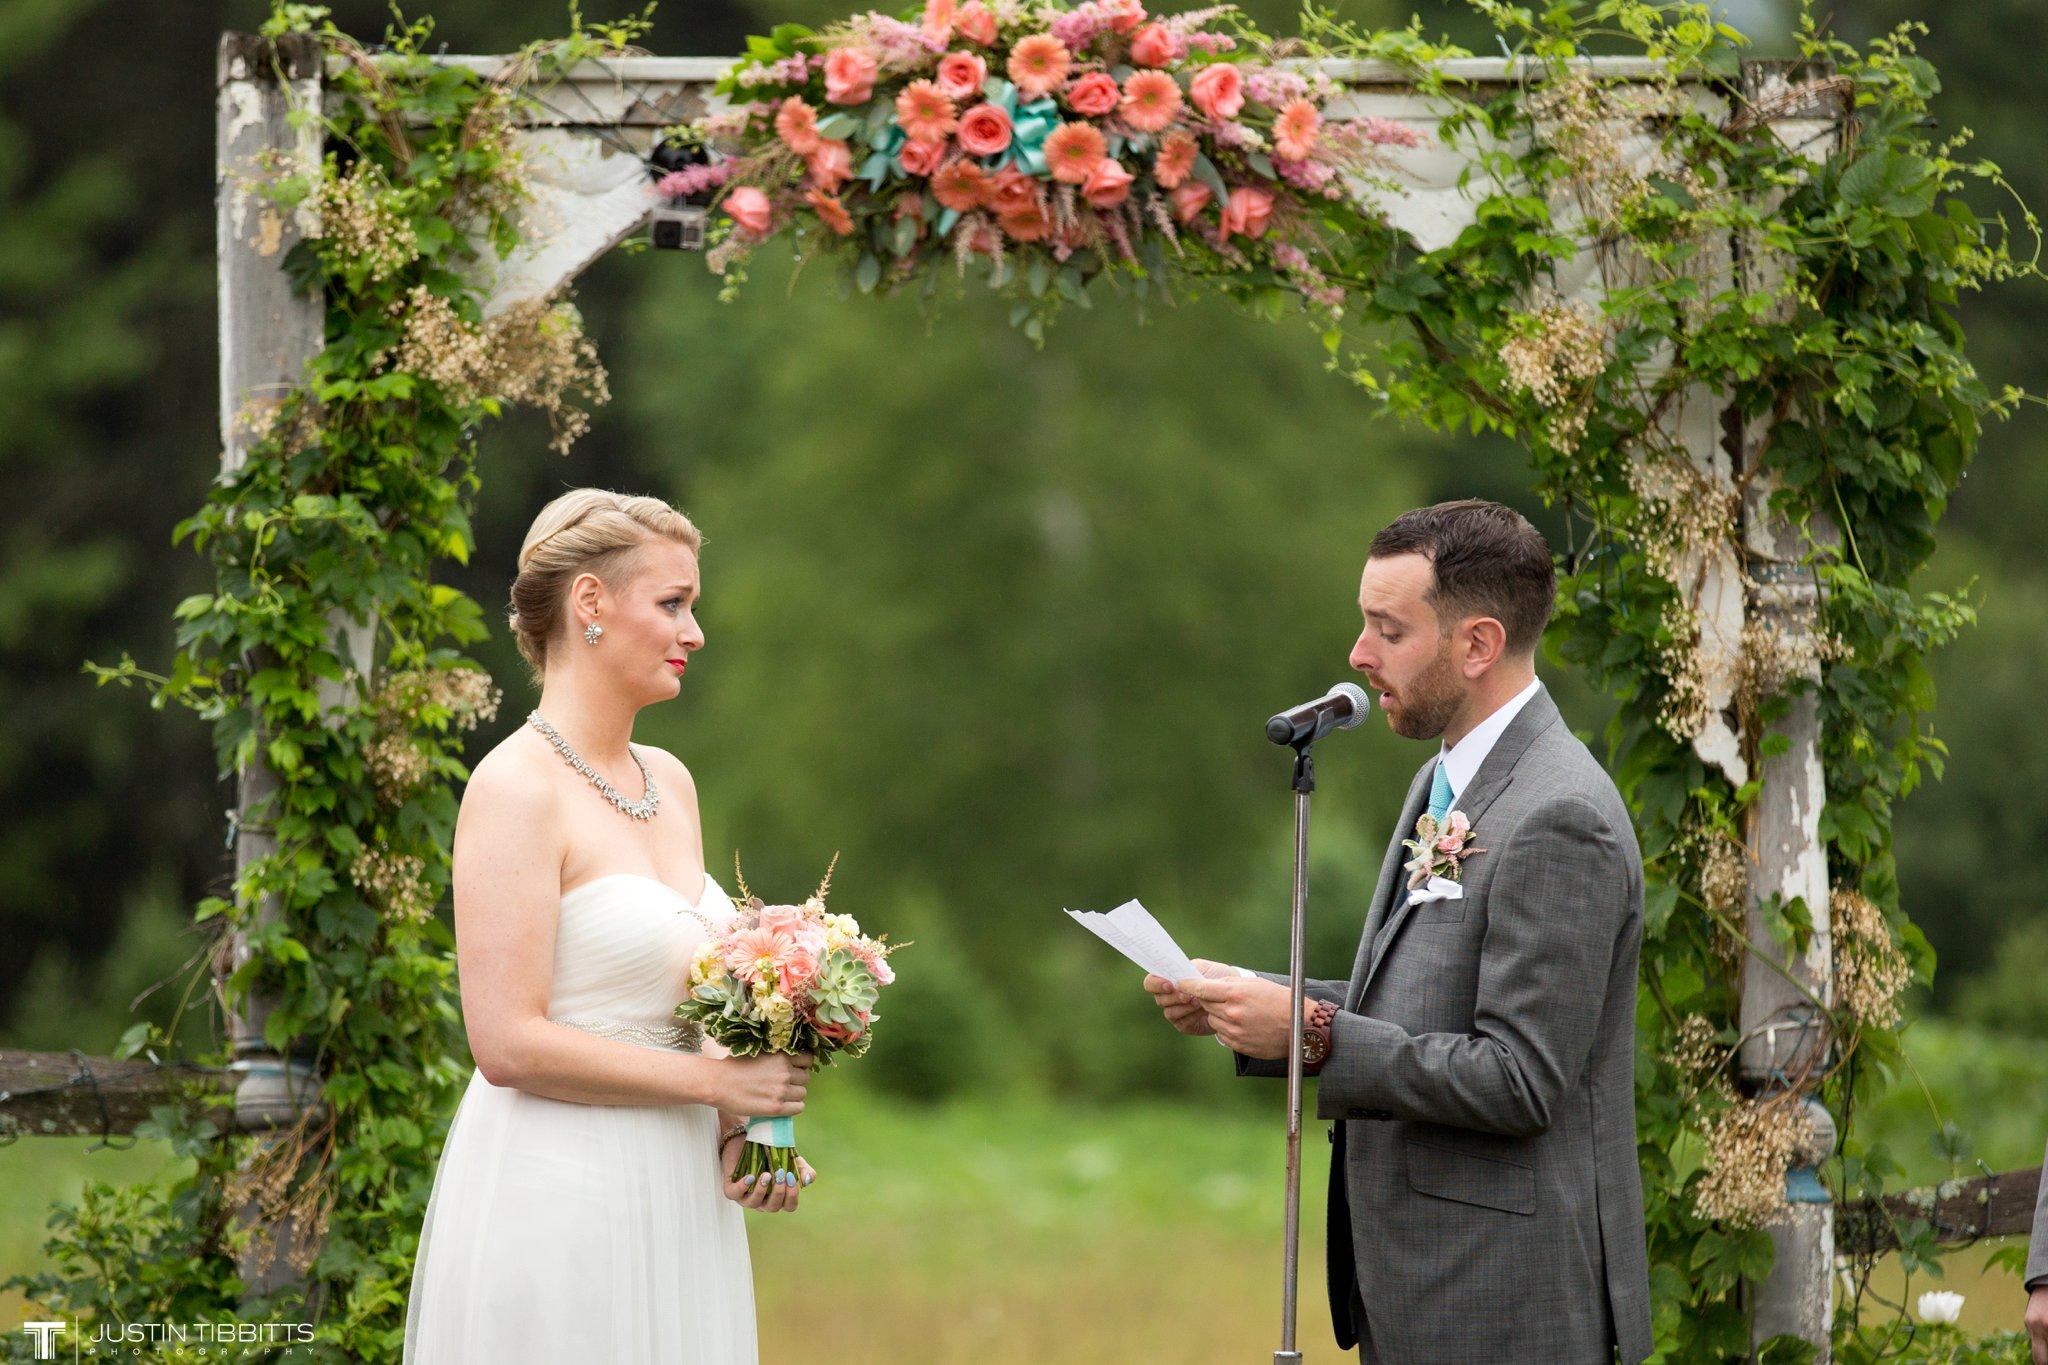 burlap-and-beams-wedding-photos-with-joran-and-molly_0067